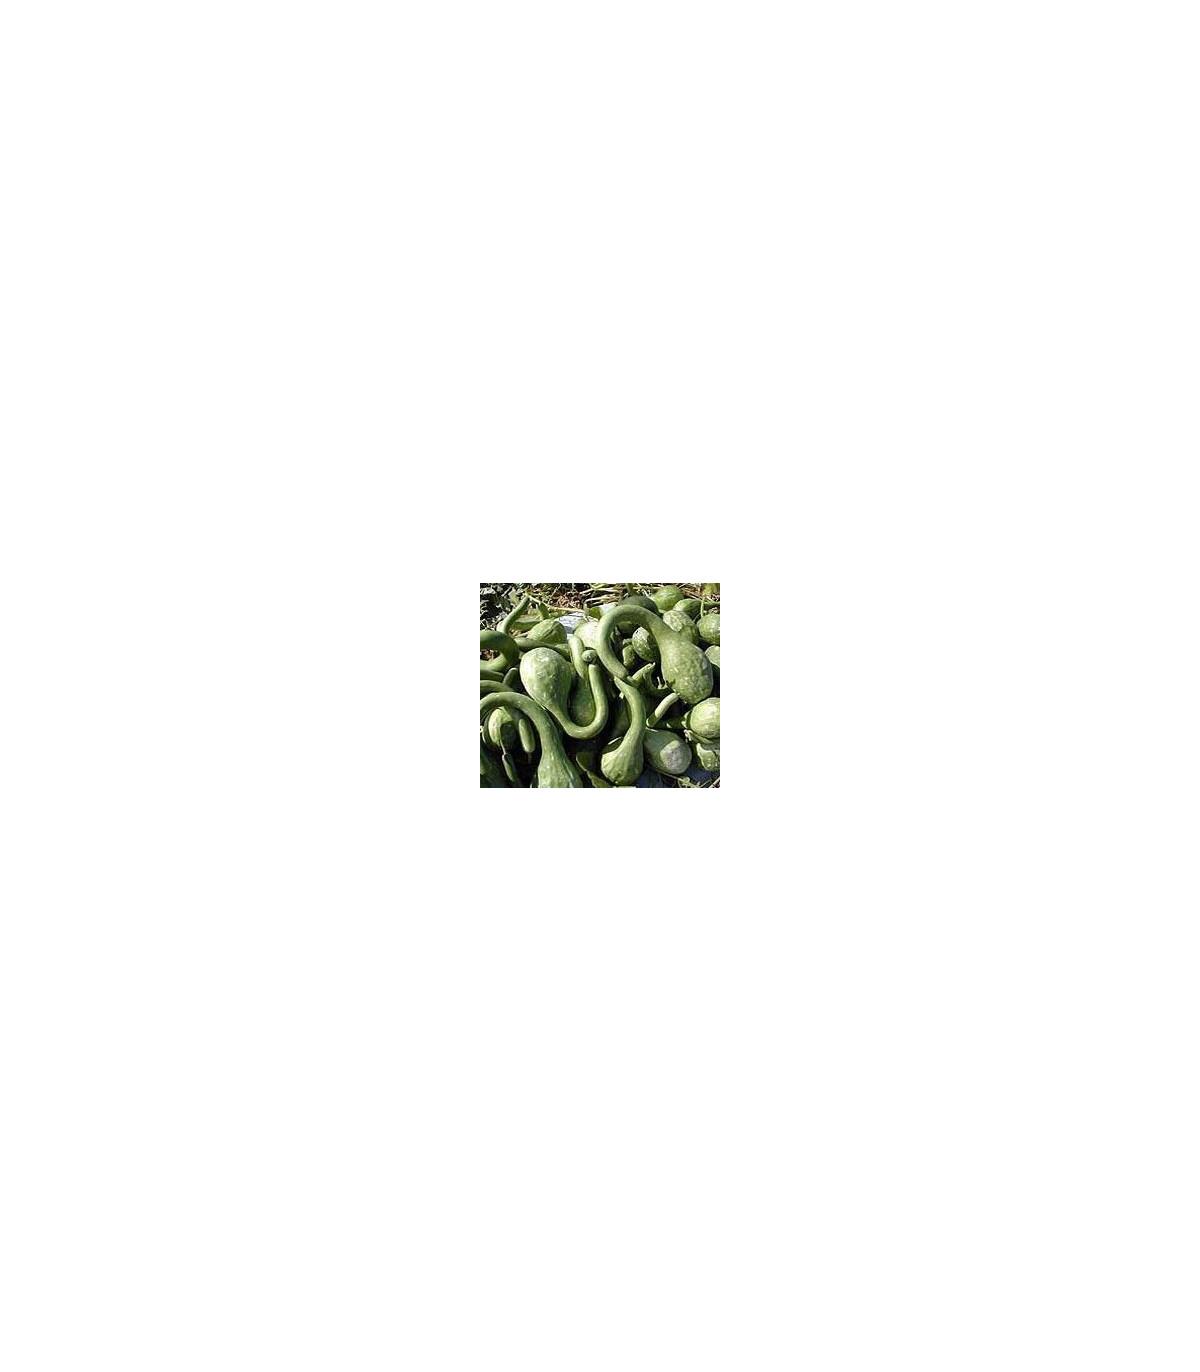 Indická uhorka Lagenária Dipper - Lagenaria siceraria - semená tykve - 6 ks